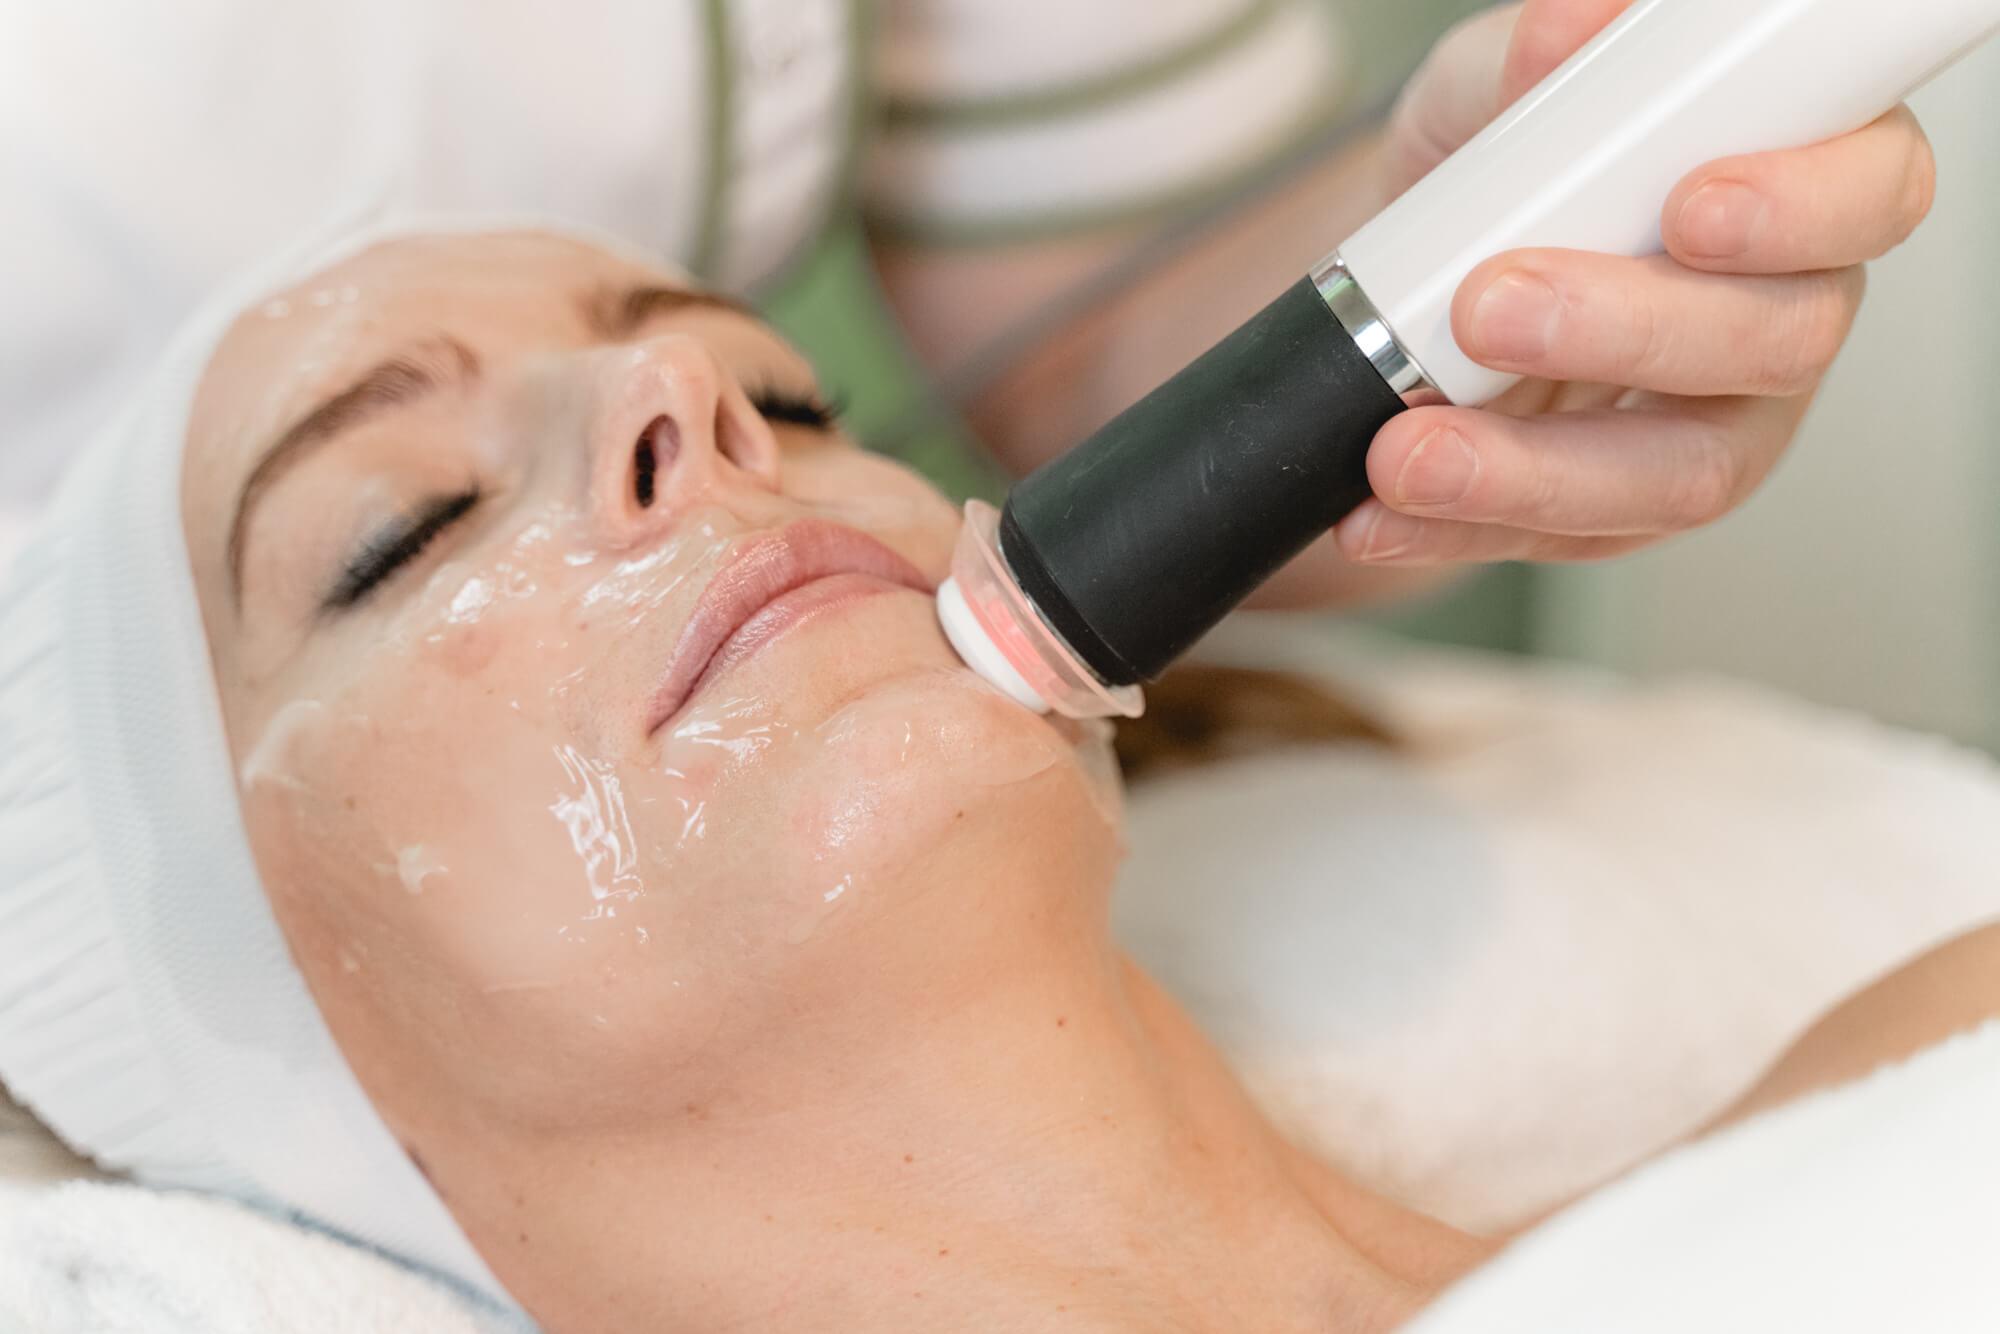 Kosmetik_Driller_Kosmetikstudio_Bruchsal-132